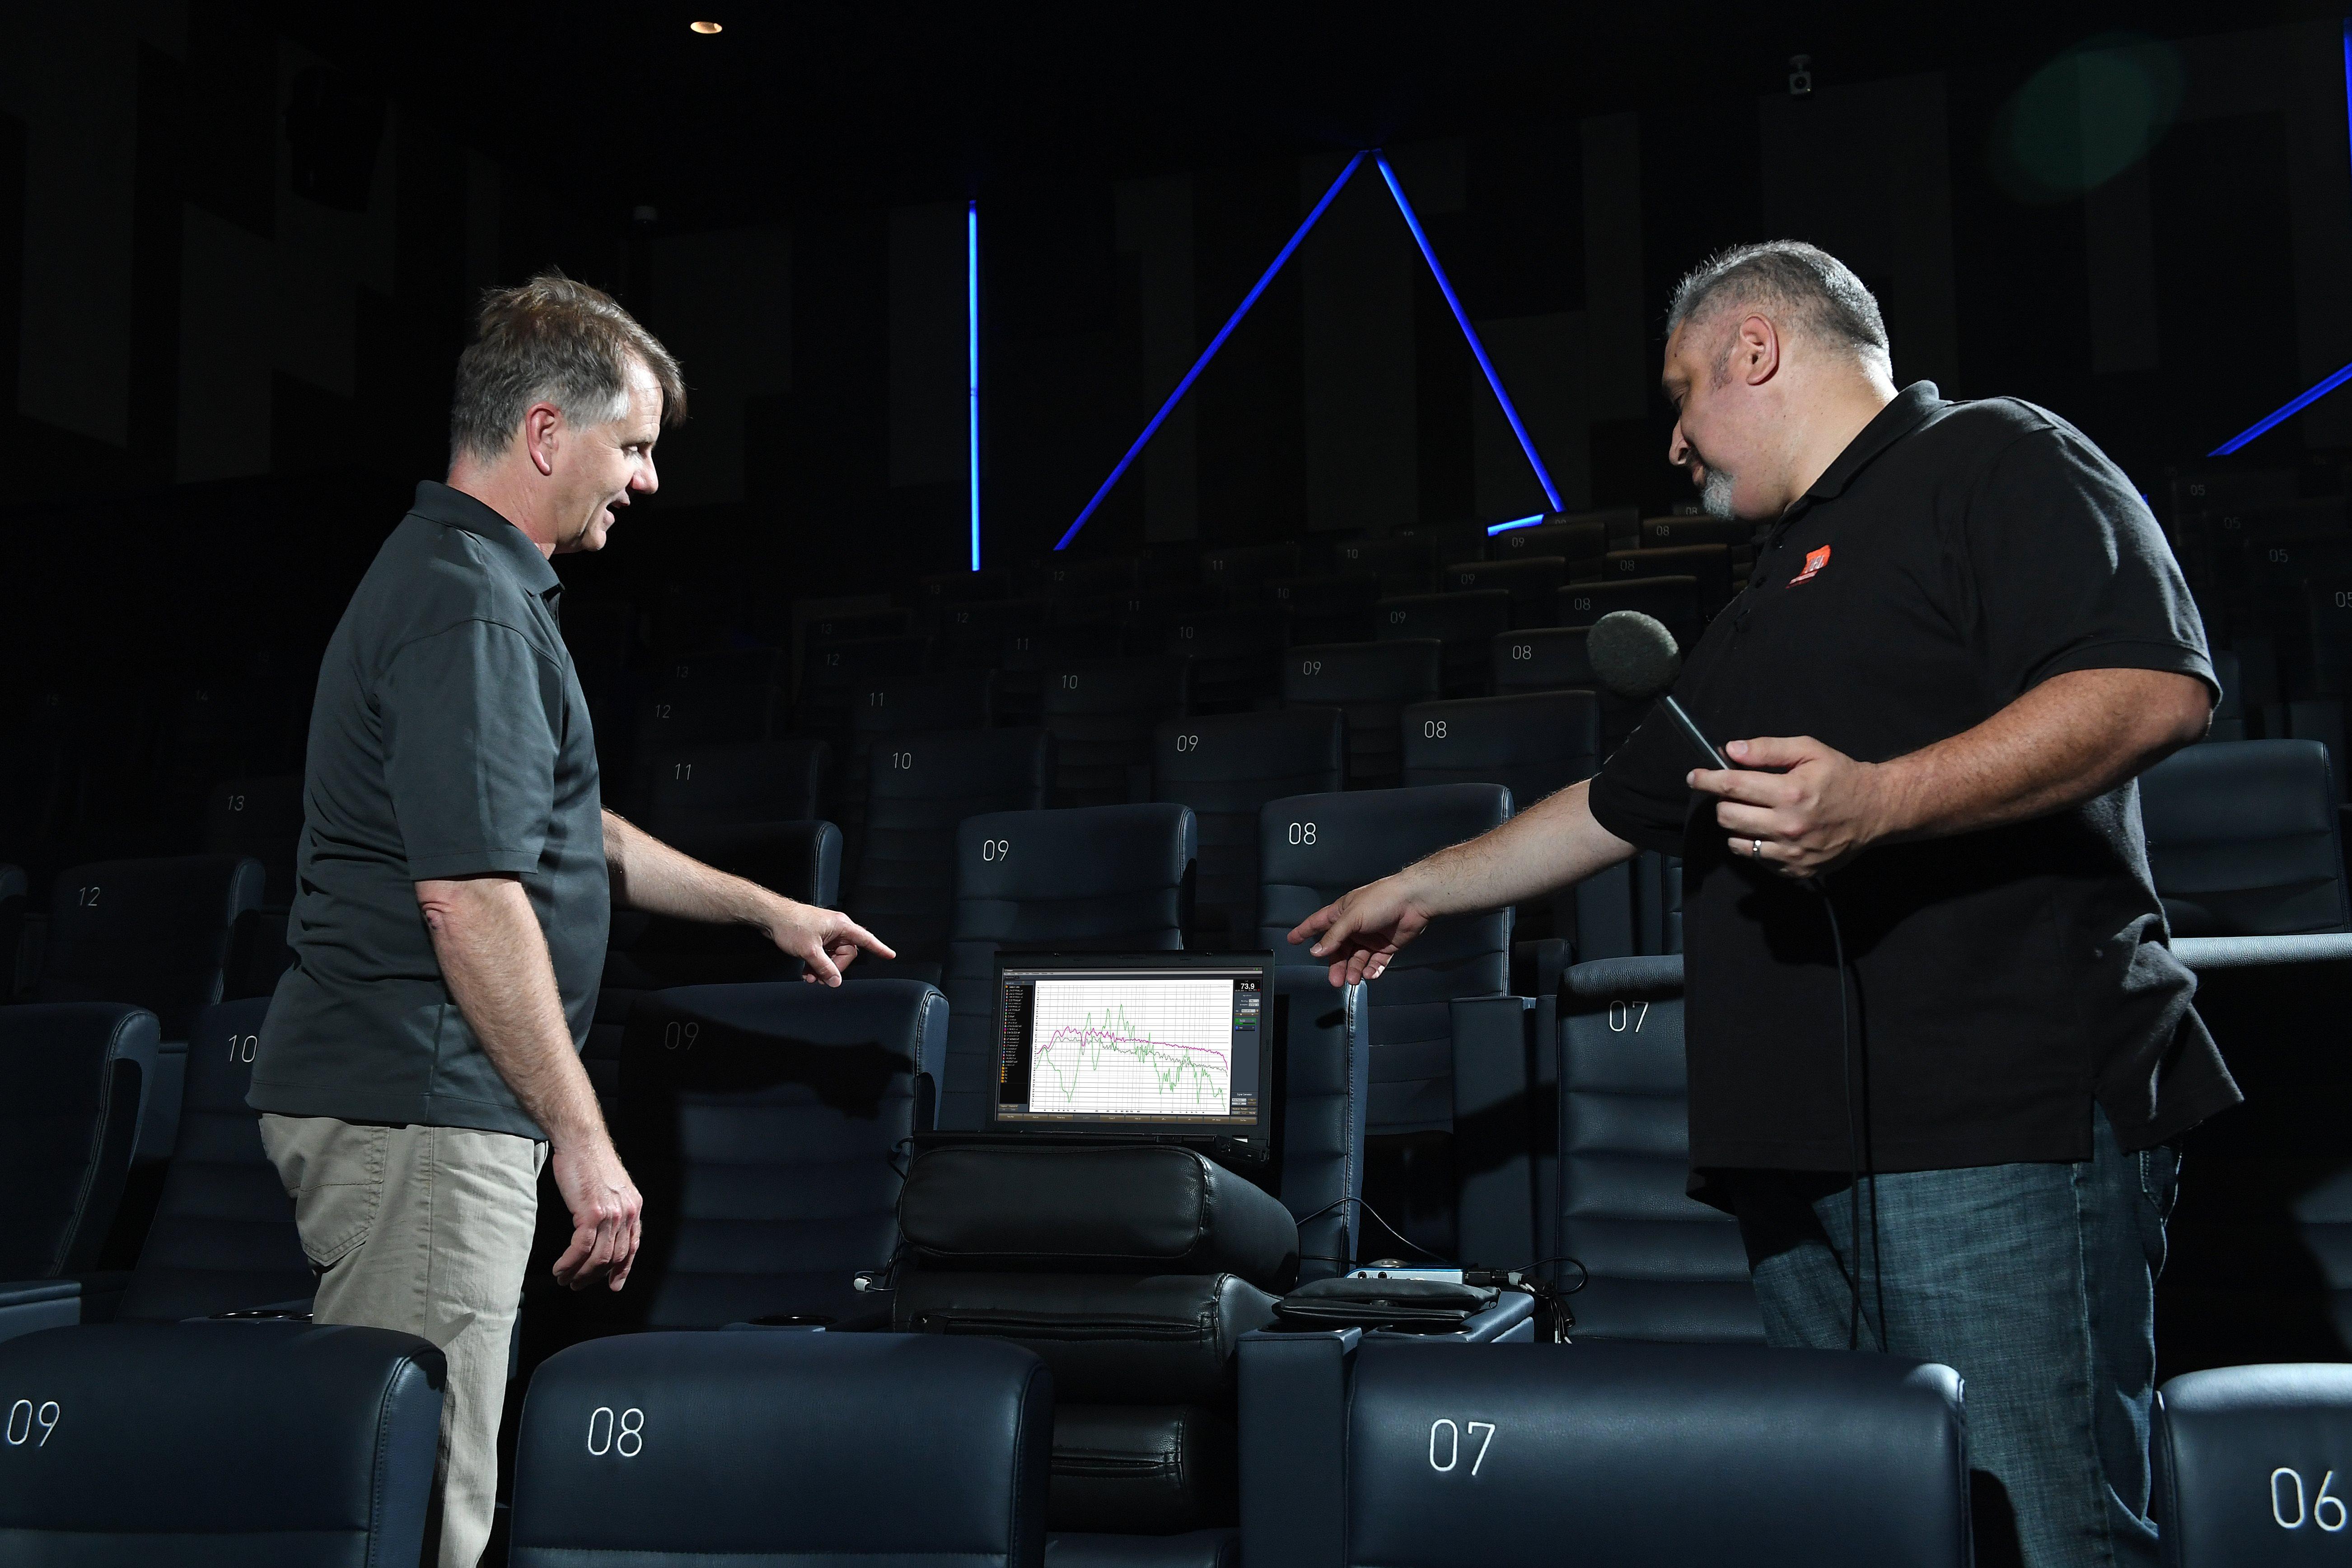 World's First Cinema LED Display